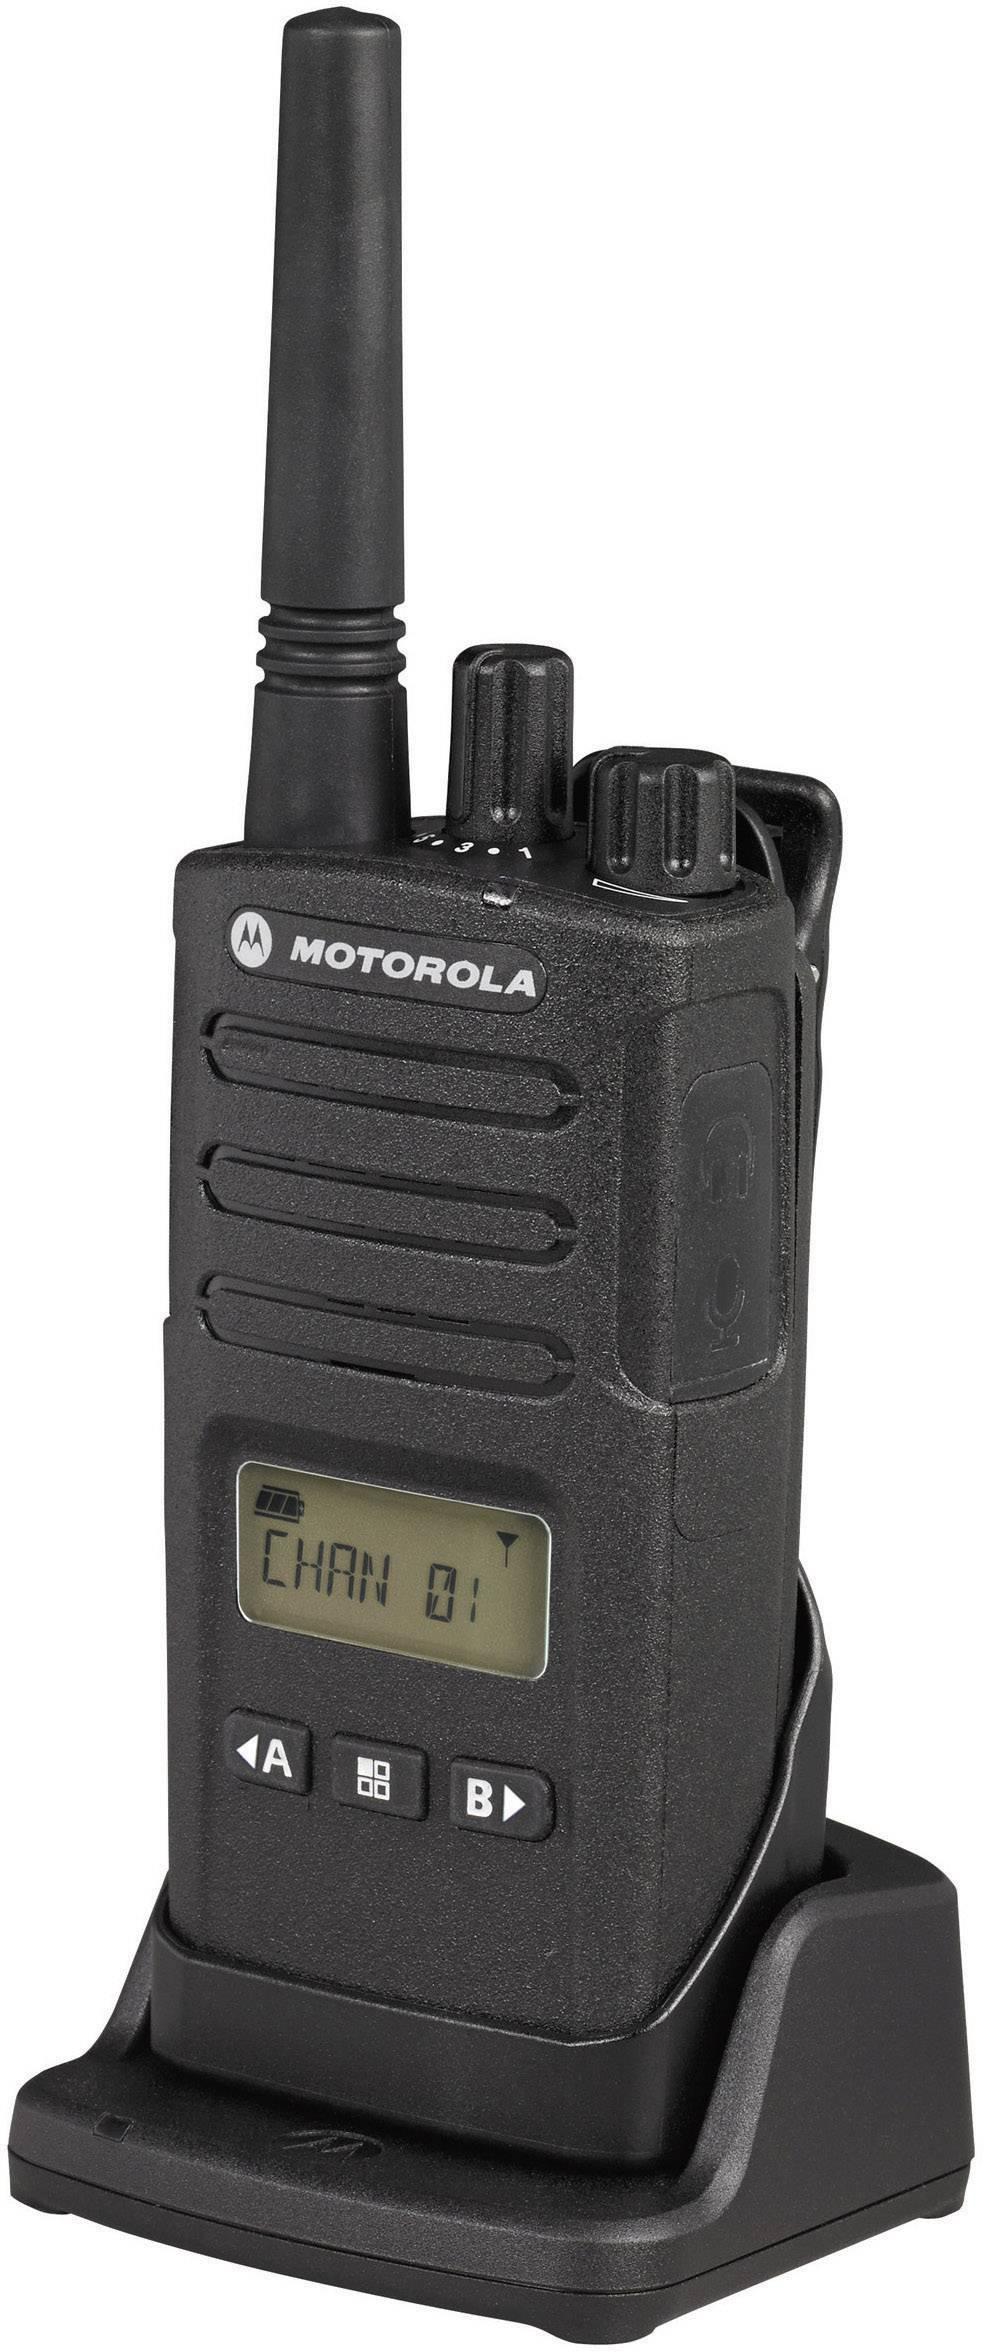 PMR rádiostanica Motorola XT 460